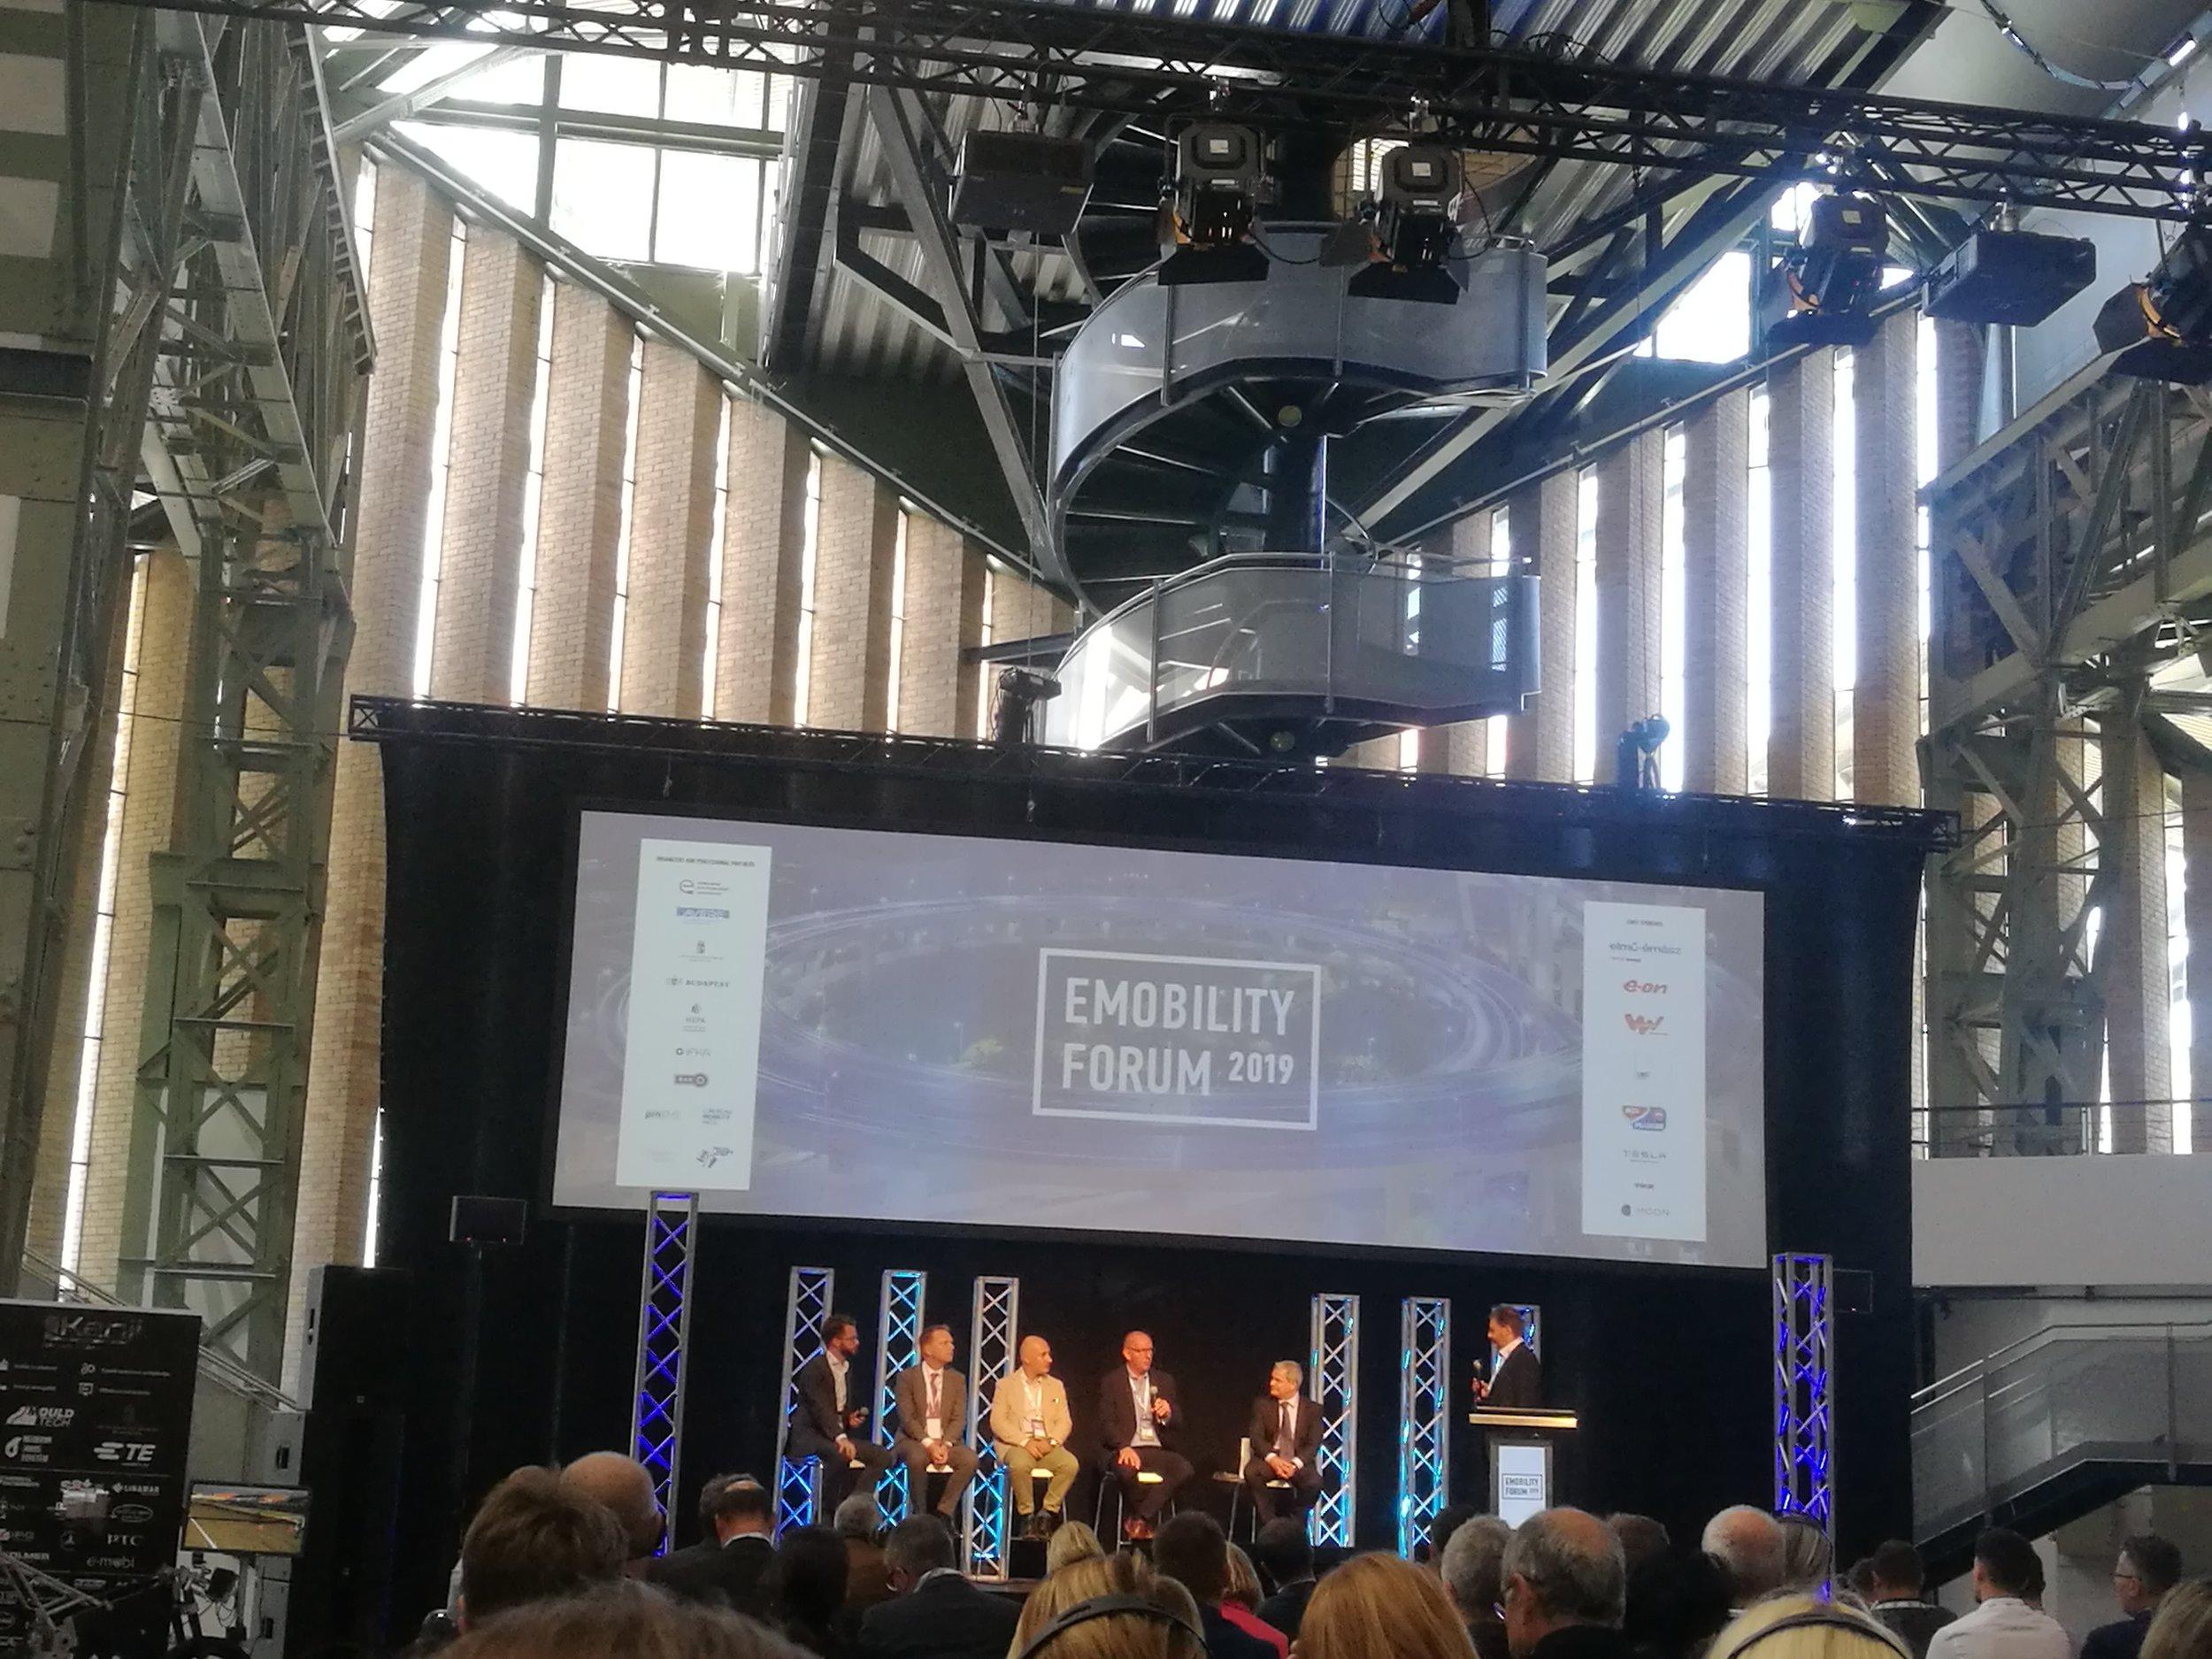 e-mobility forum panel discussion